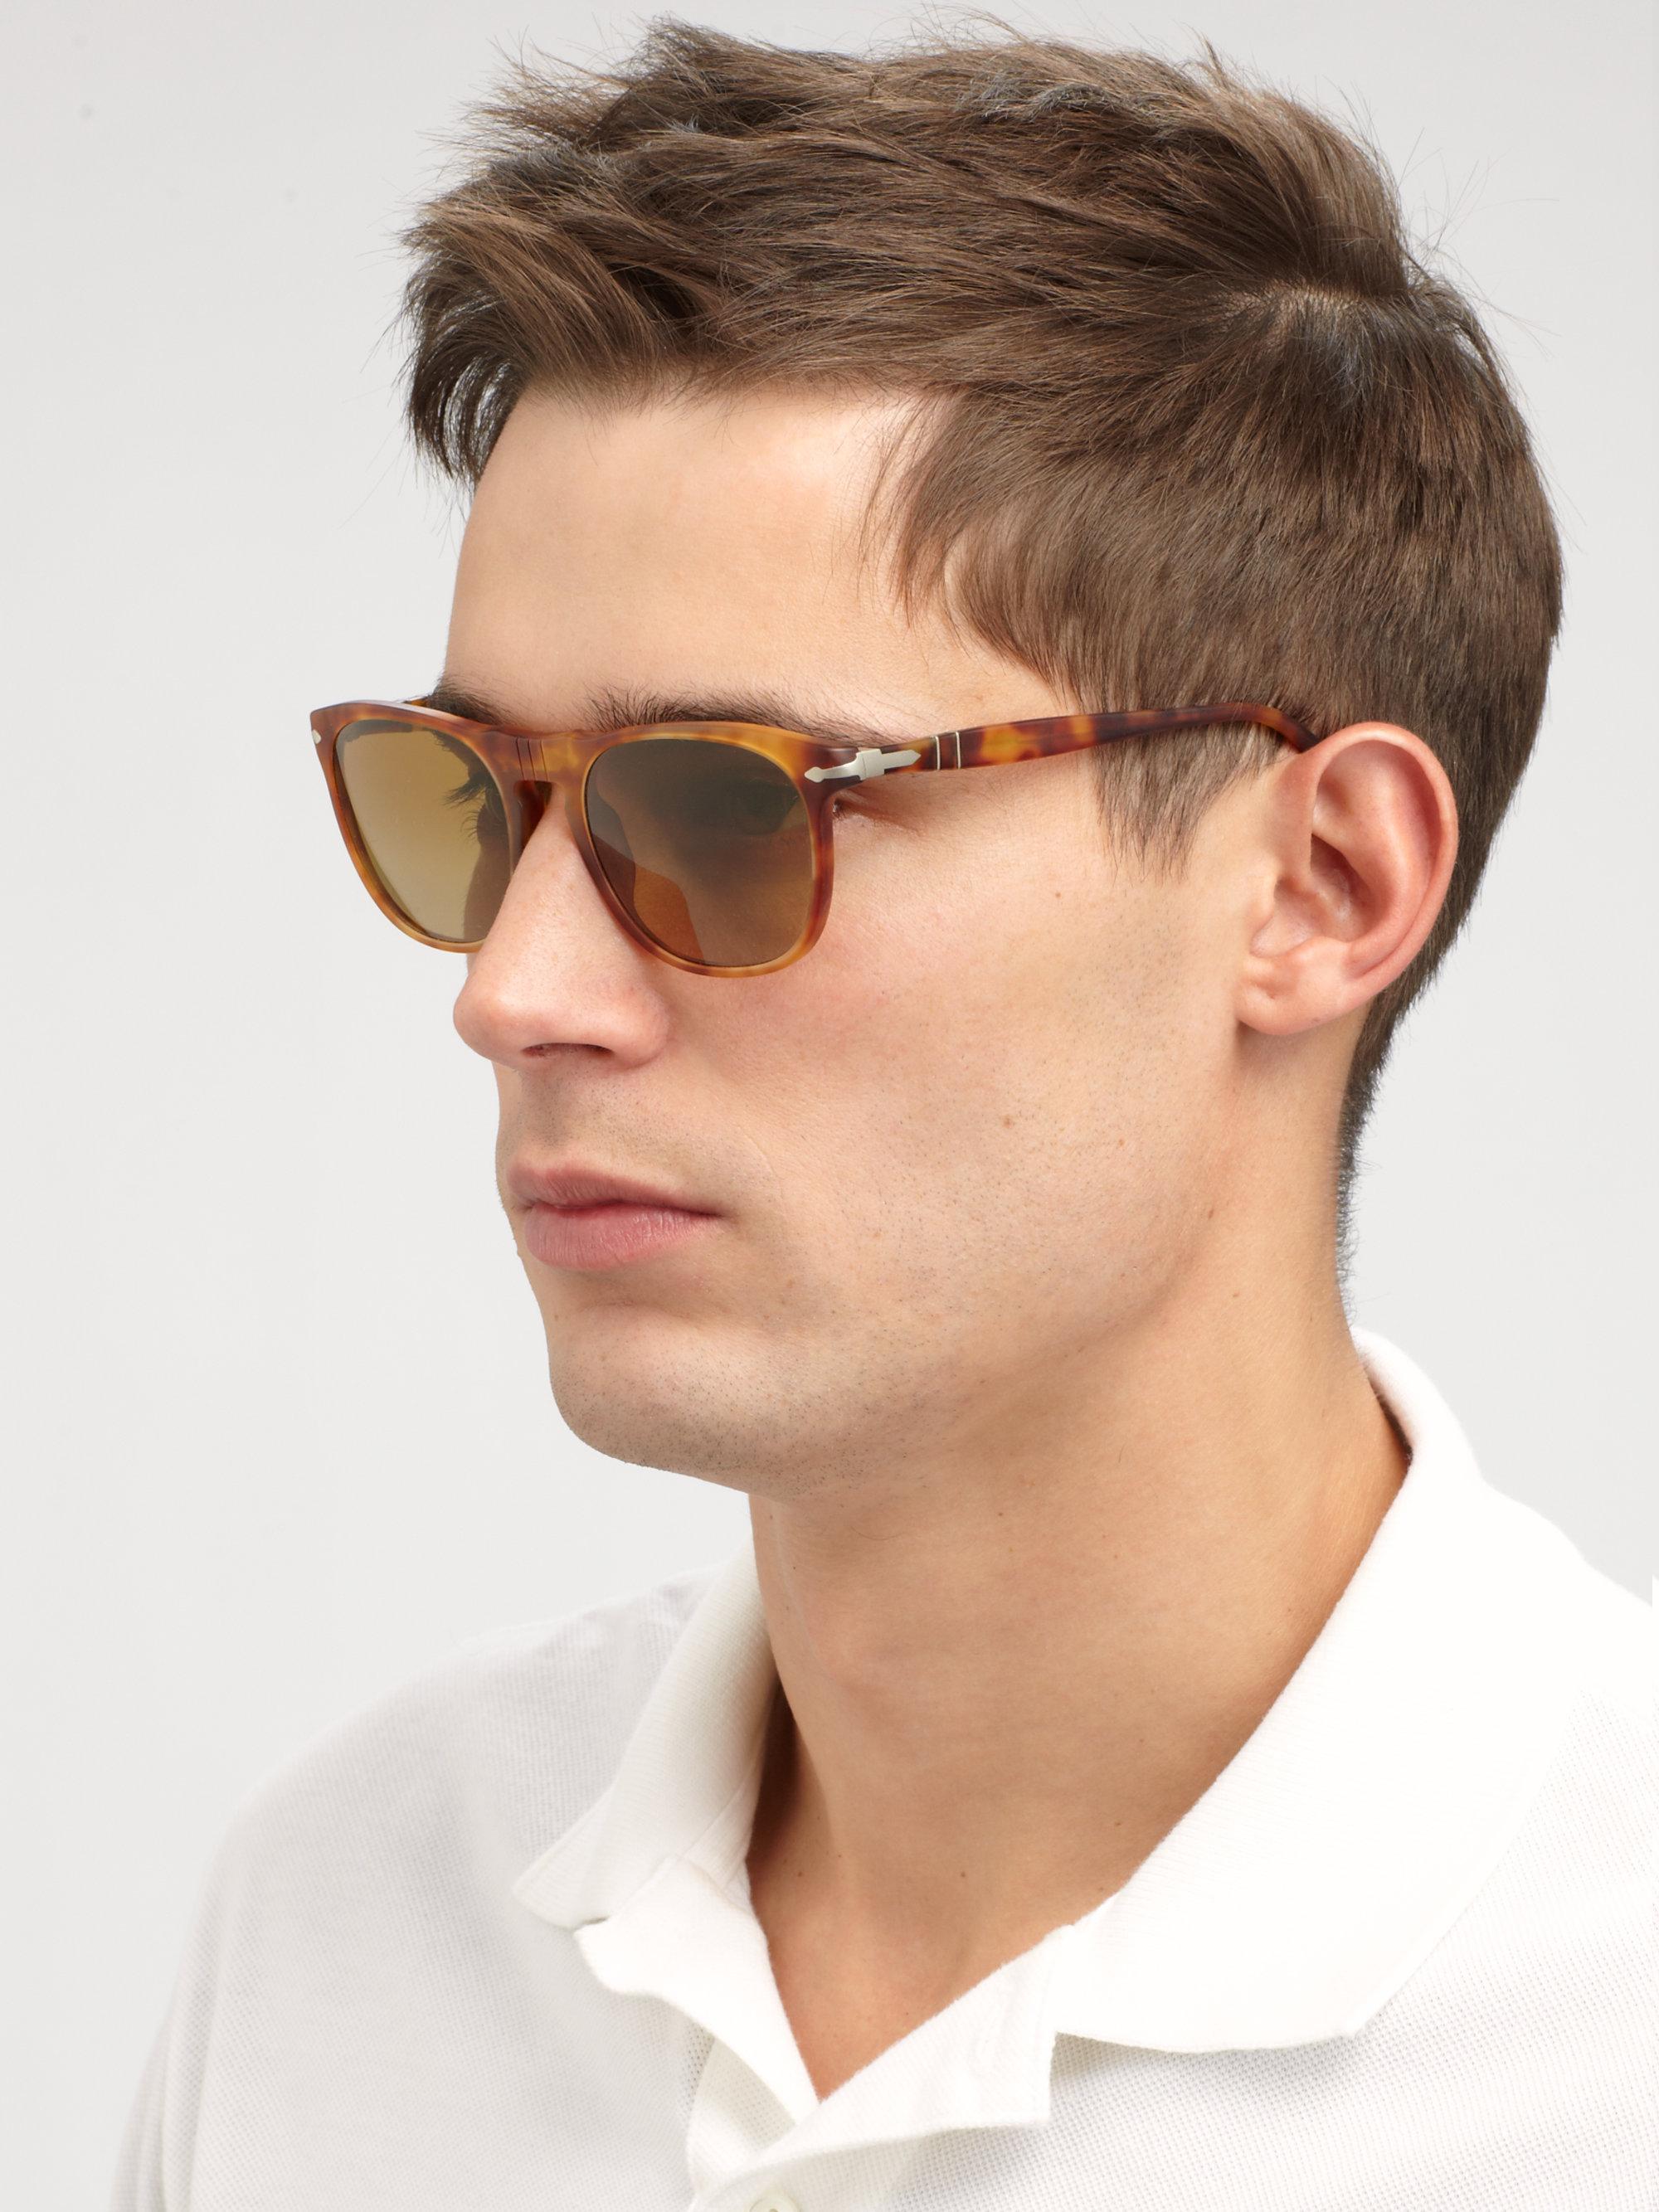 dcd408bdd2223 Lyst Sunglasses Vintage Flattop In Persol Keyhole Brown rUfwrp